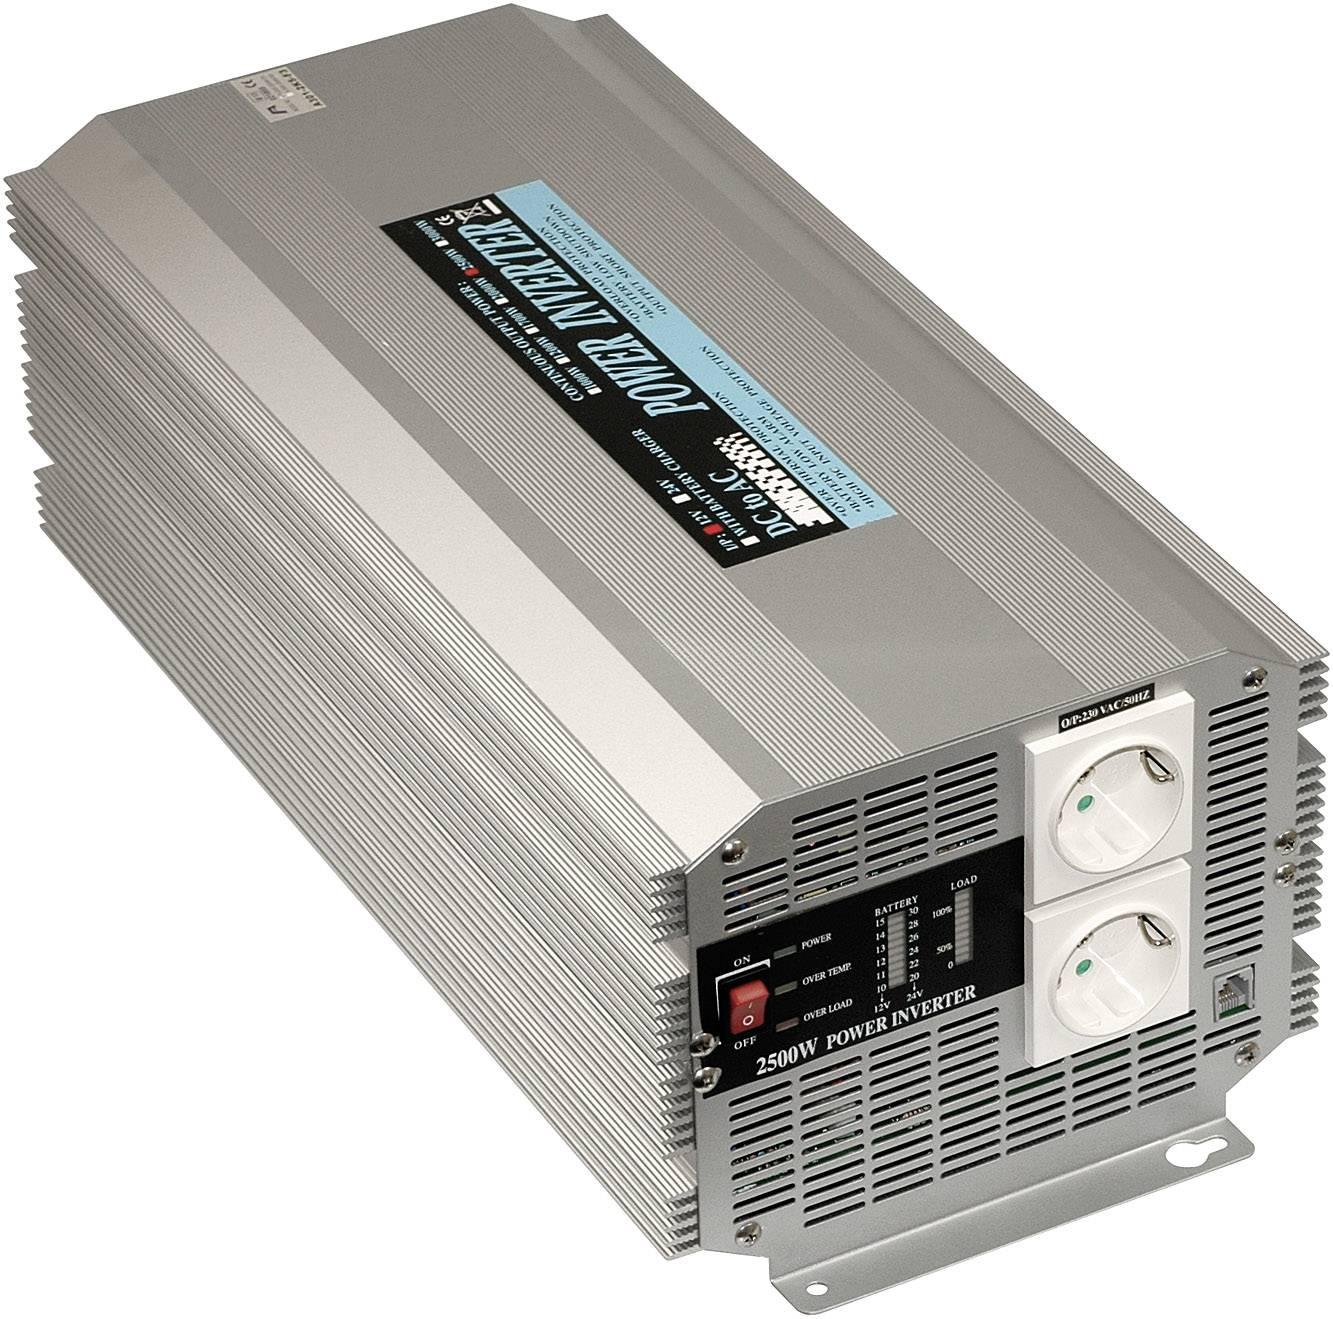 Menič napätia DC / AC Mean Well A301-2K5-F3, 2500 W, 12 V/DC/2500 W